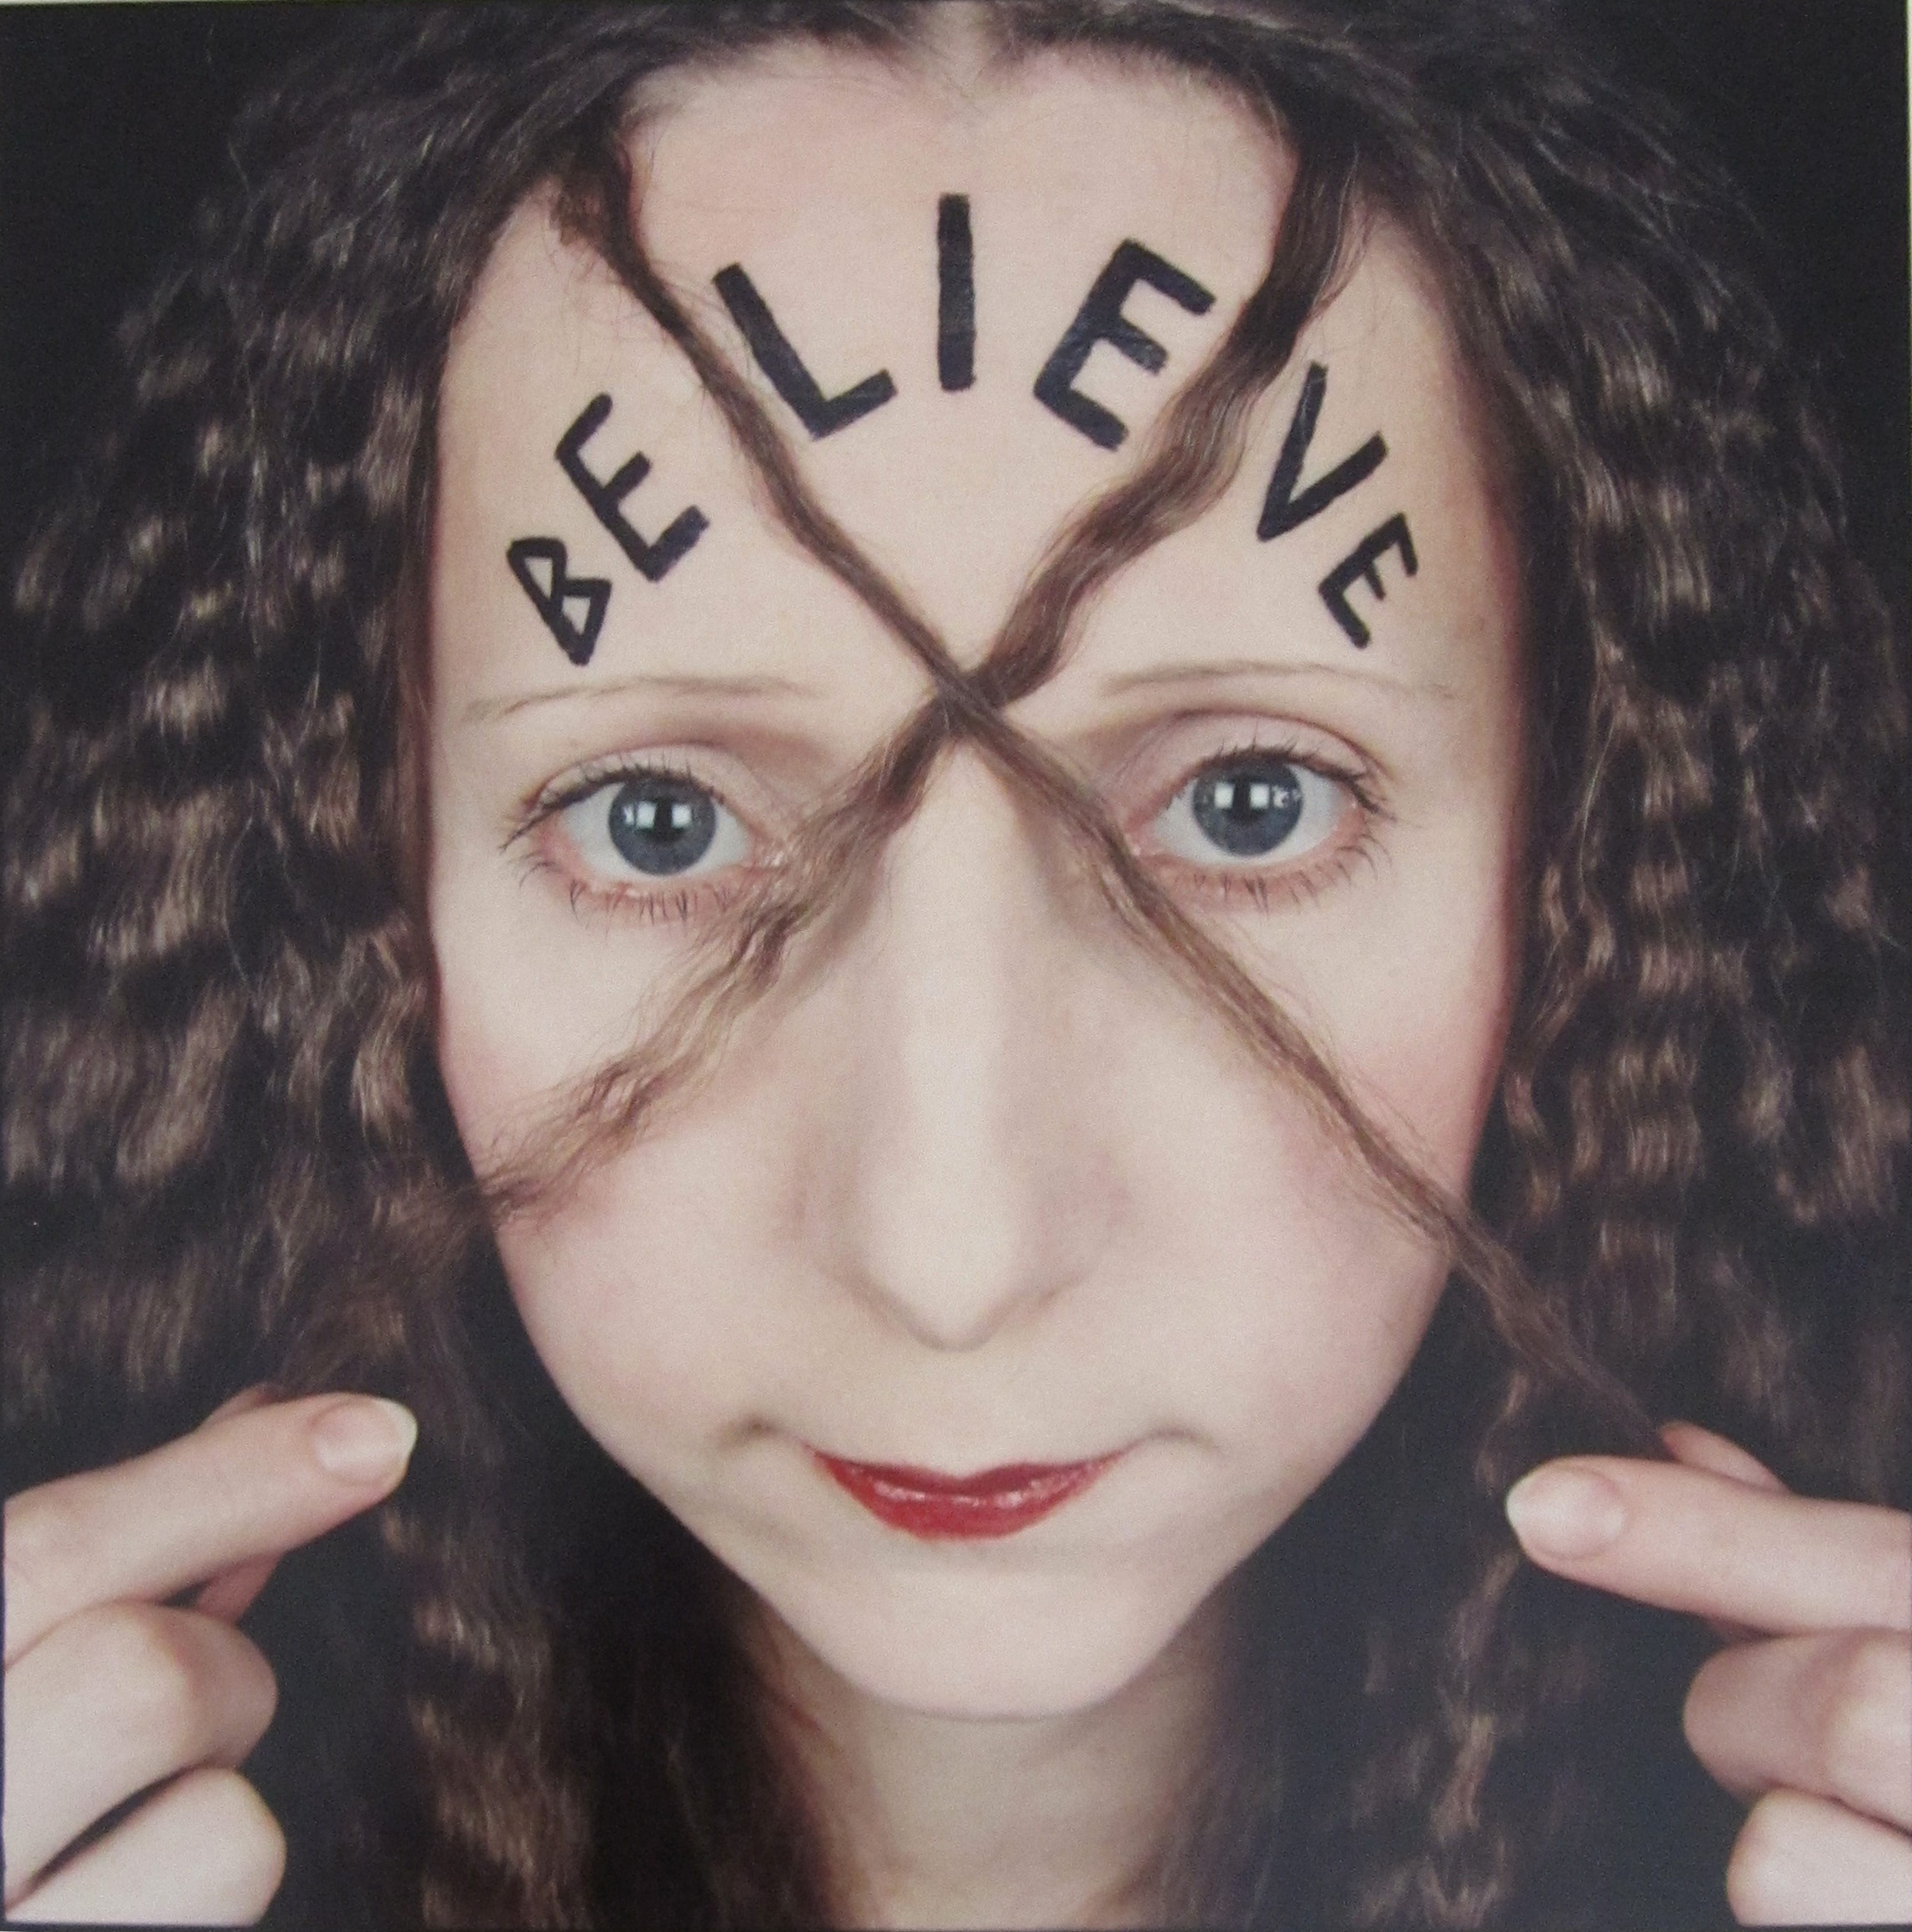 BelievefromStill Performances